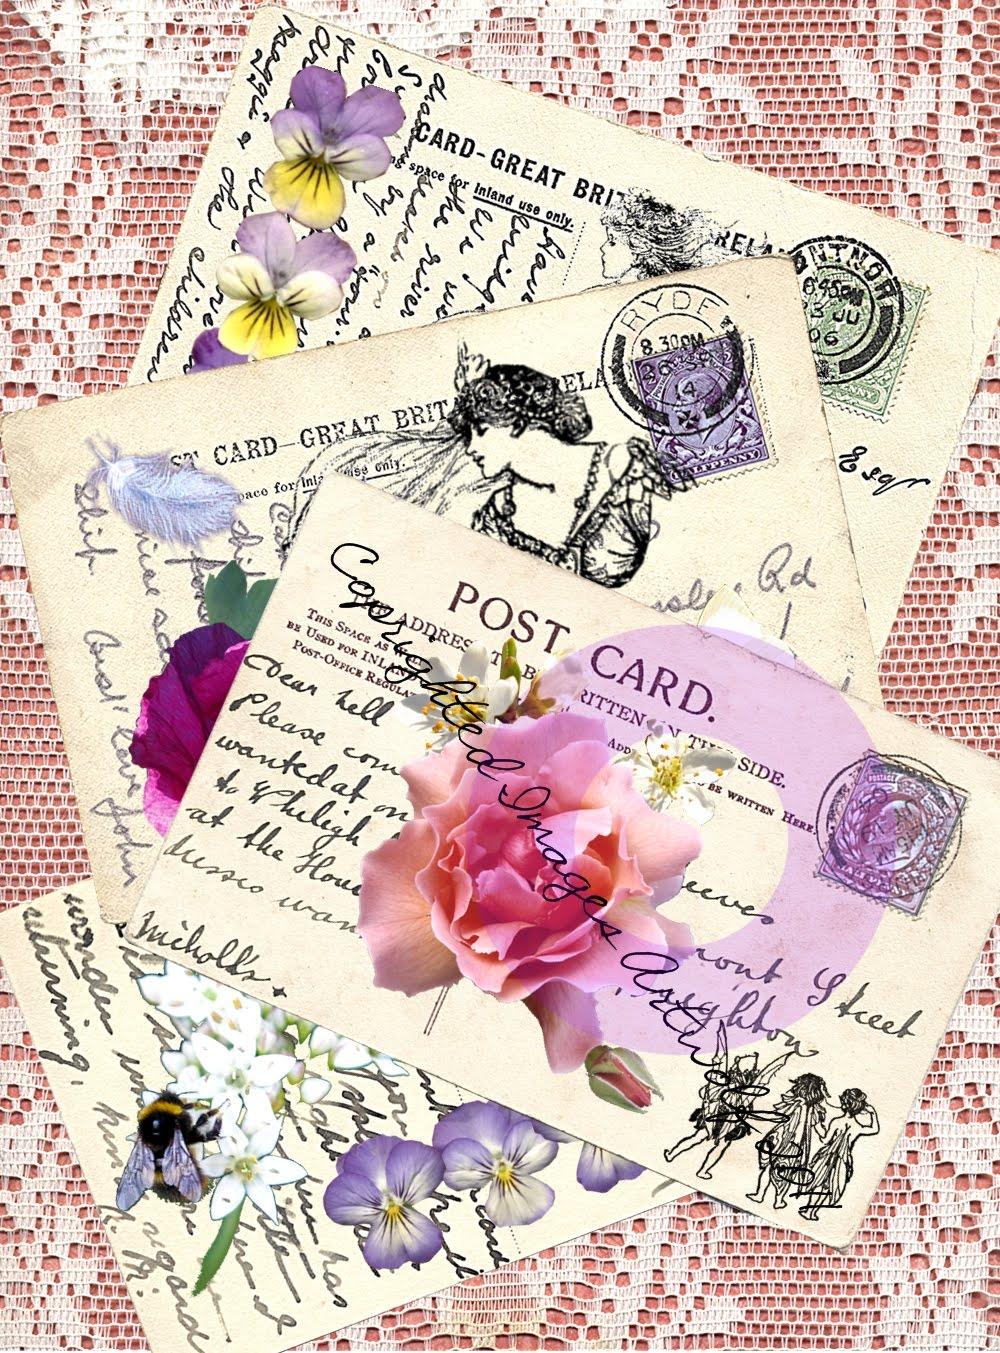 The Briar Rose Gate: Fairy Digital Vintage Style Postcards